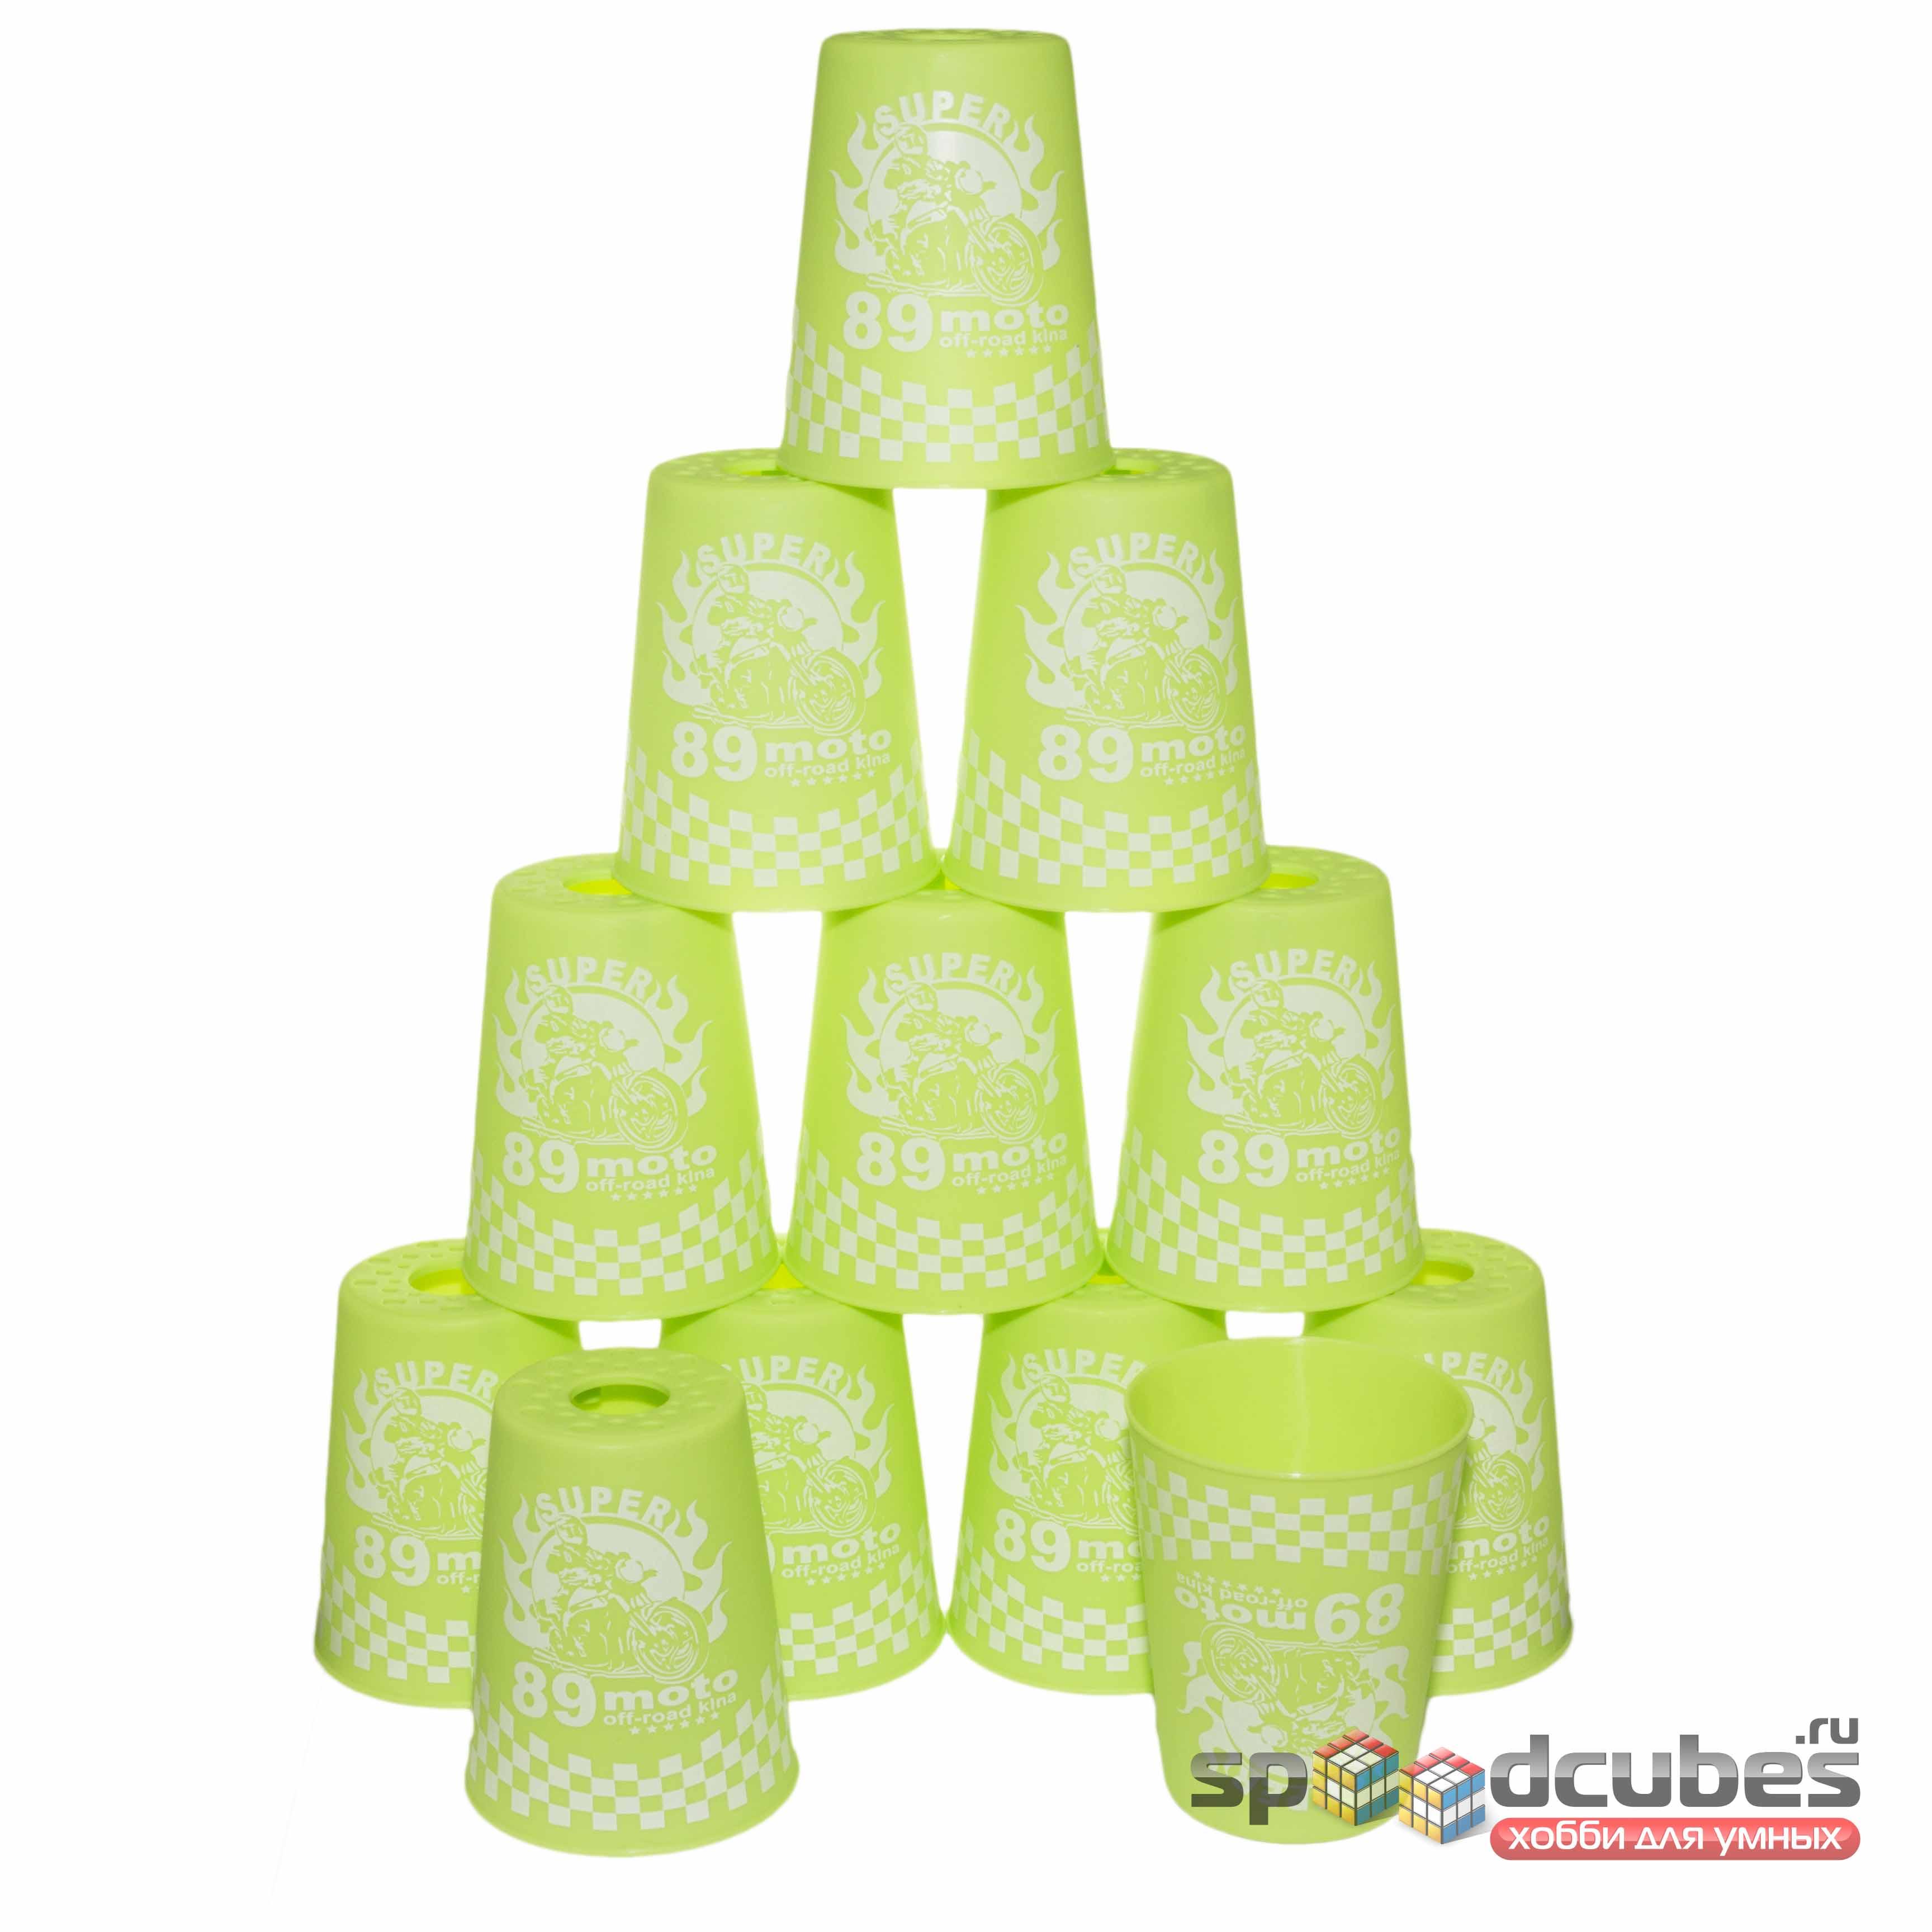 Yj стаканы для спидстакинга зелёные 2